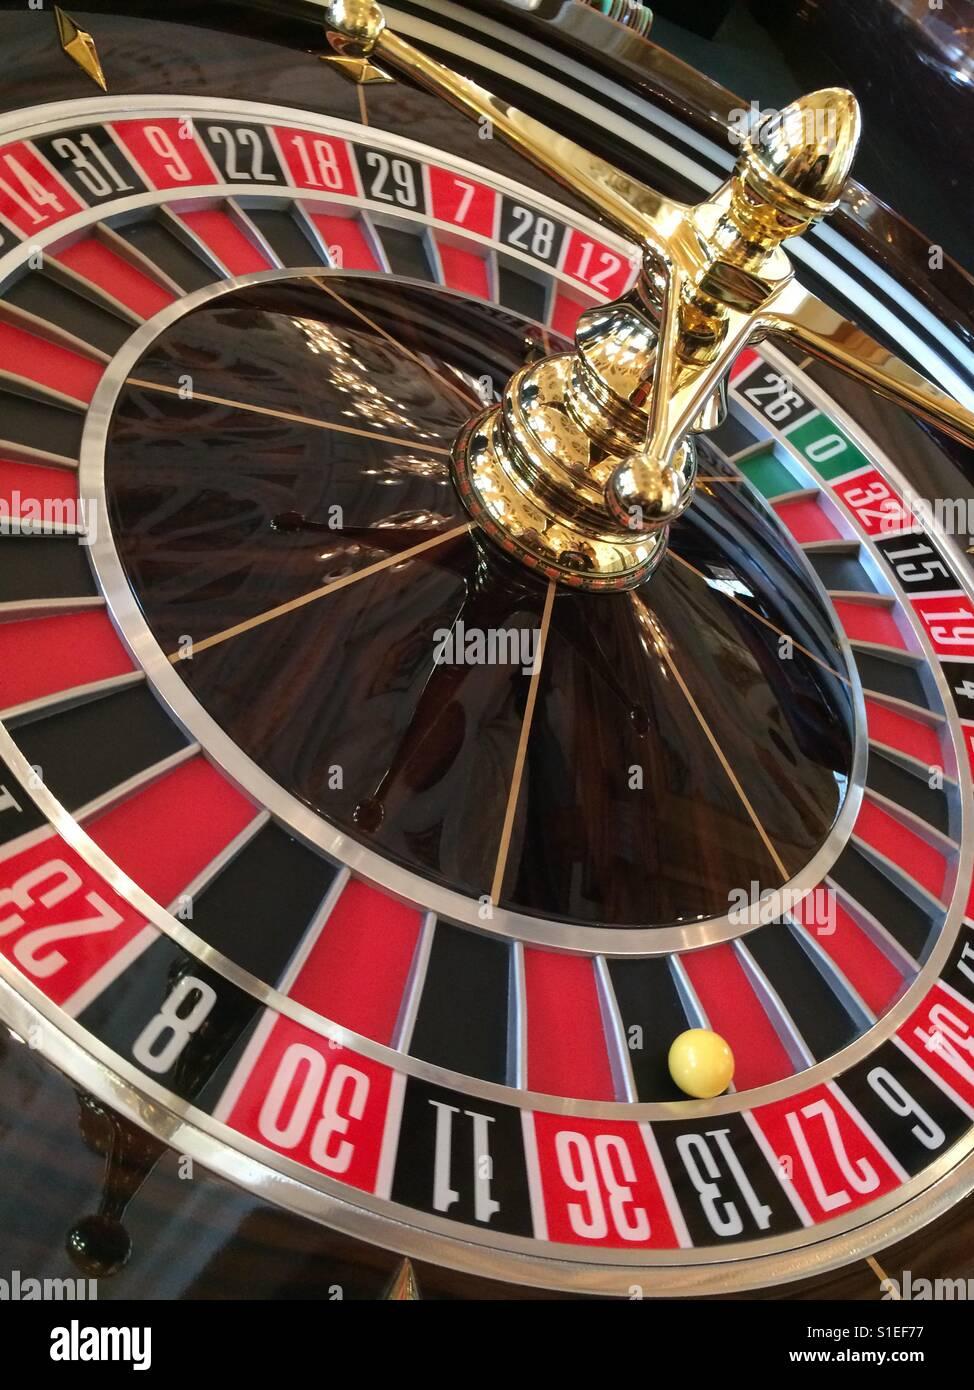 Roulette wheel - Stock Image